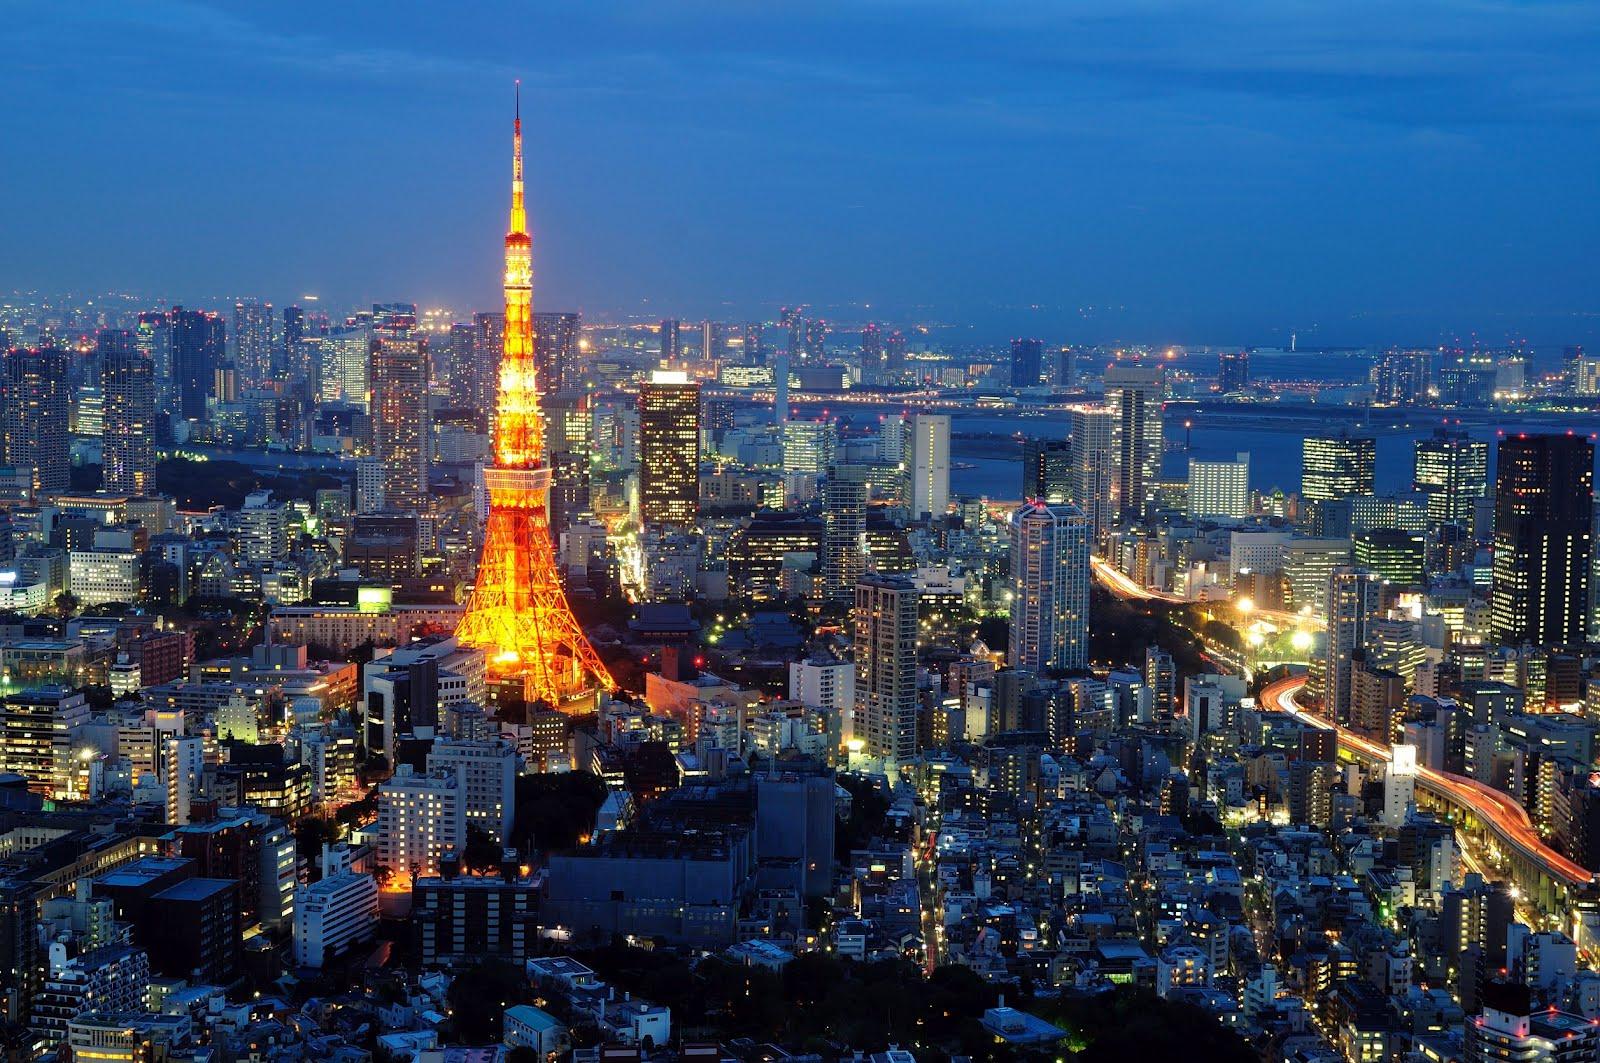 http://4.bp.blogspot.com/-lJ-a4-cuD88/UCRZPK9dfWI/AAAAAAABDDc/tsKqeTUst6I/s1600/torre-en-tokio-tokyo-tower-ciudades-en-la-noche-vistas-nocturnas.jpg